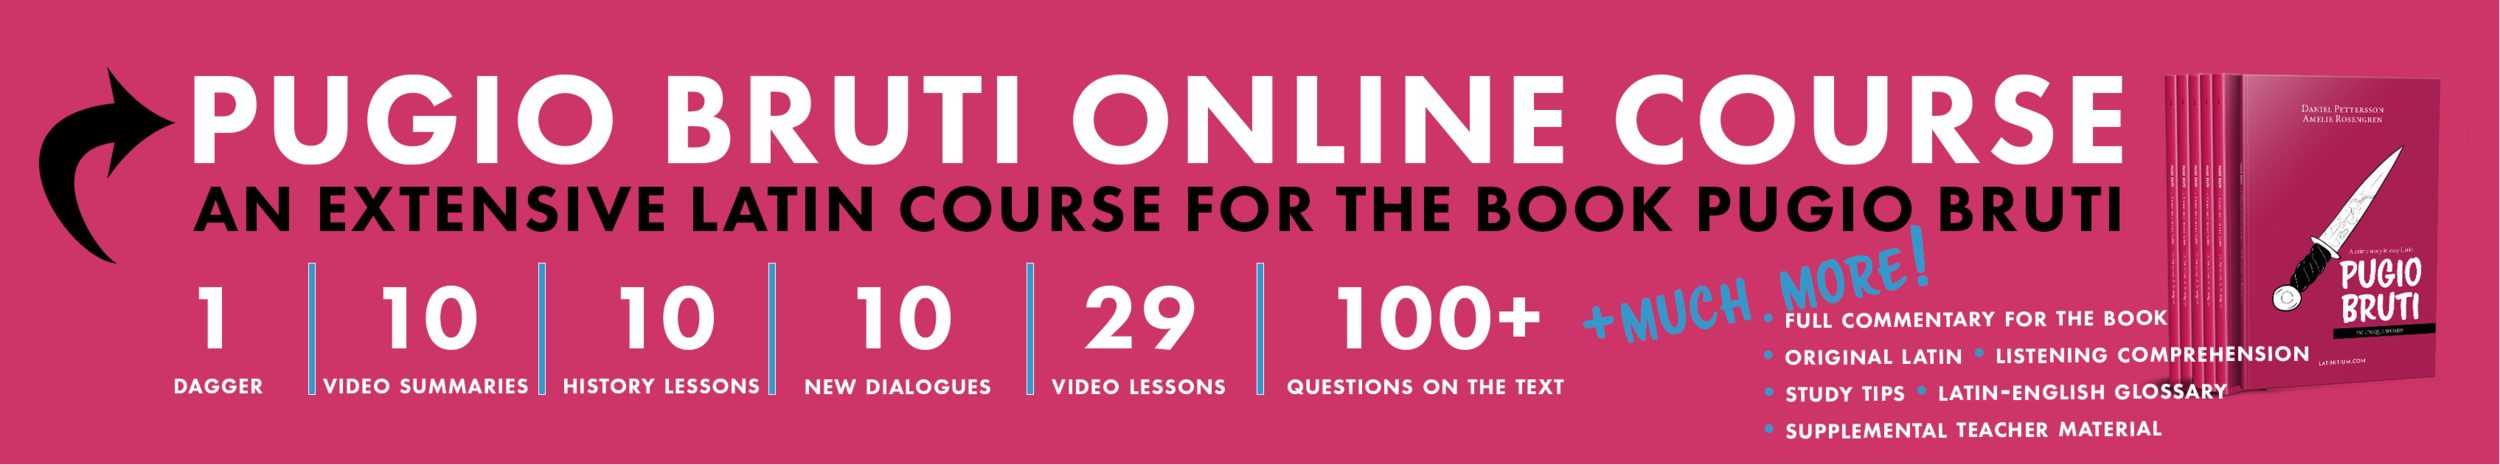 Pugio Bruti Latin Online Course banner.png